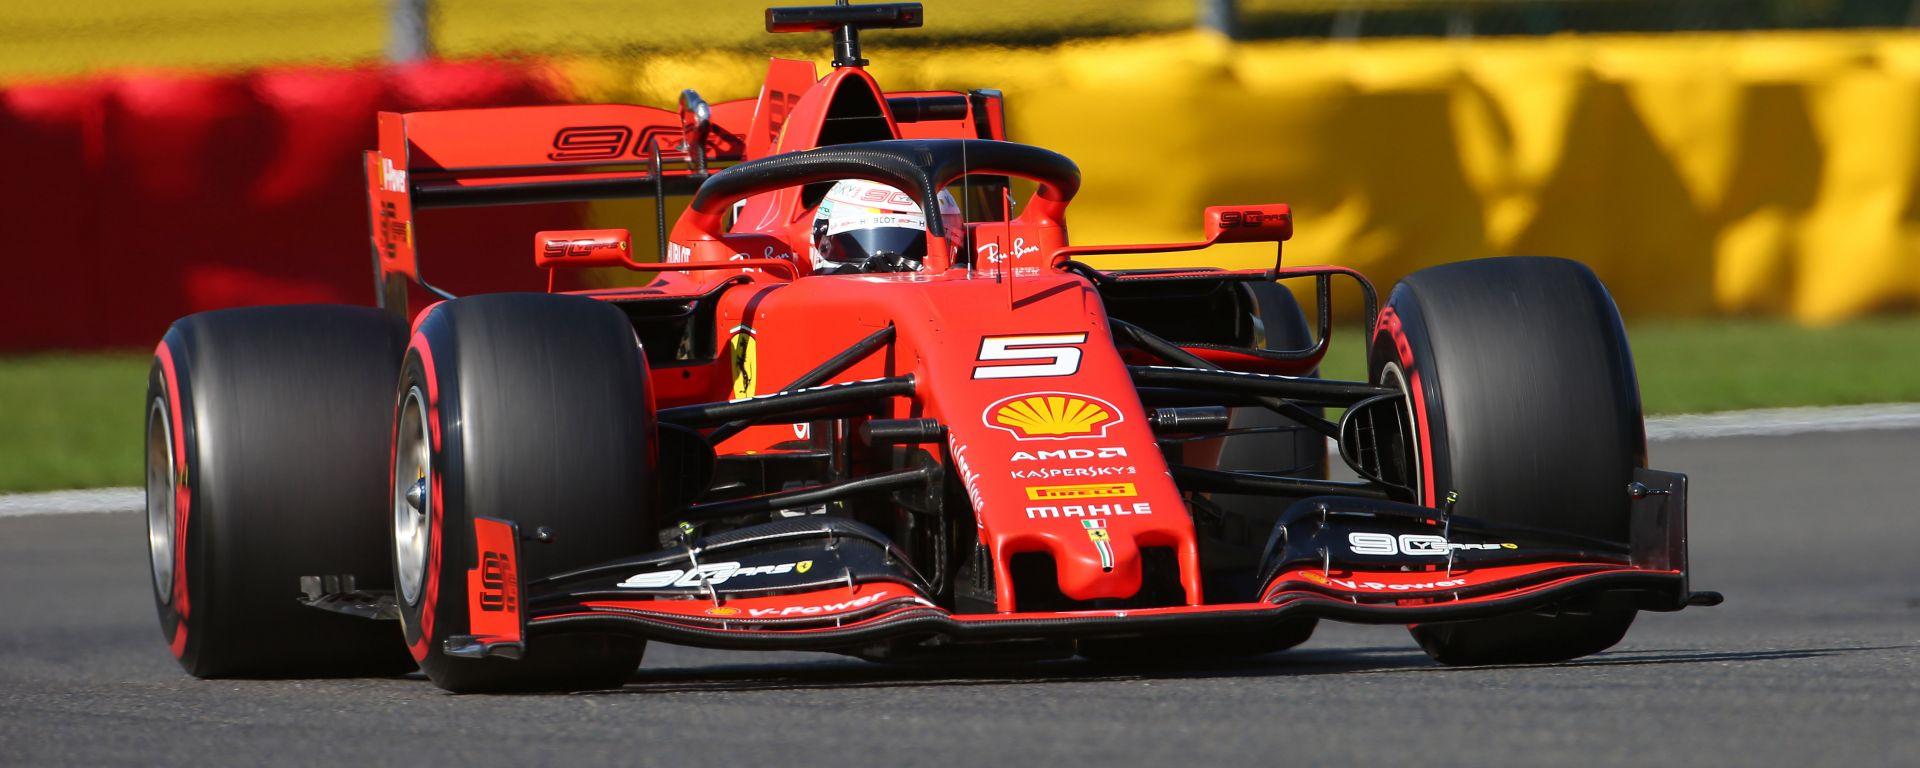 Sebastian Vettel (Ferrari SF90) in pista a Spa-Francorchamps